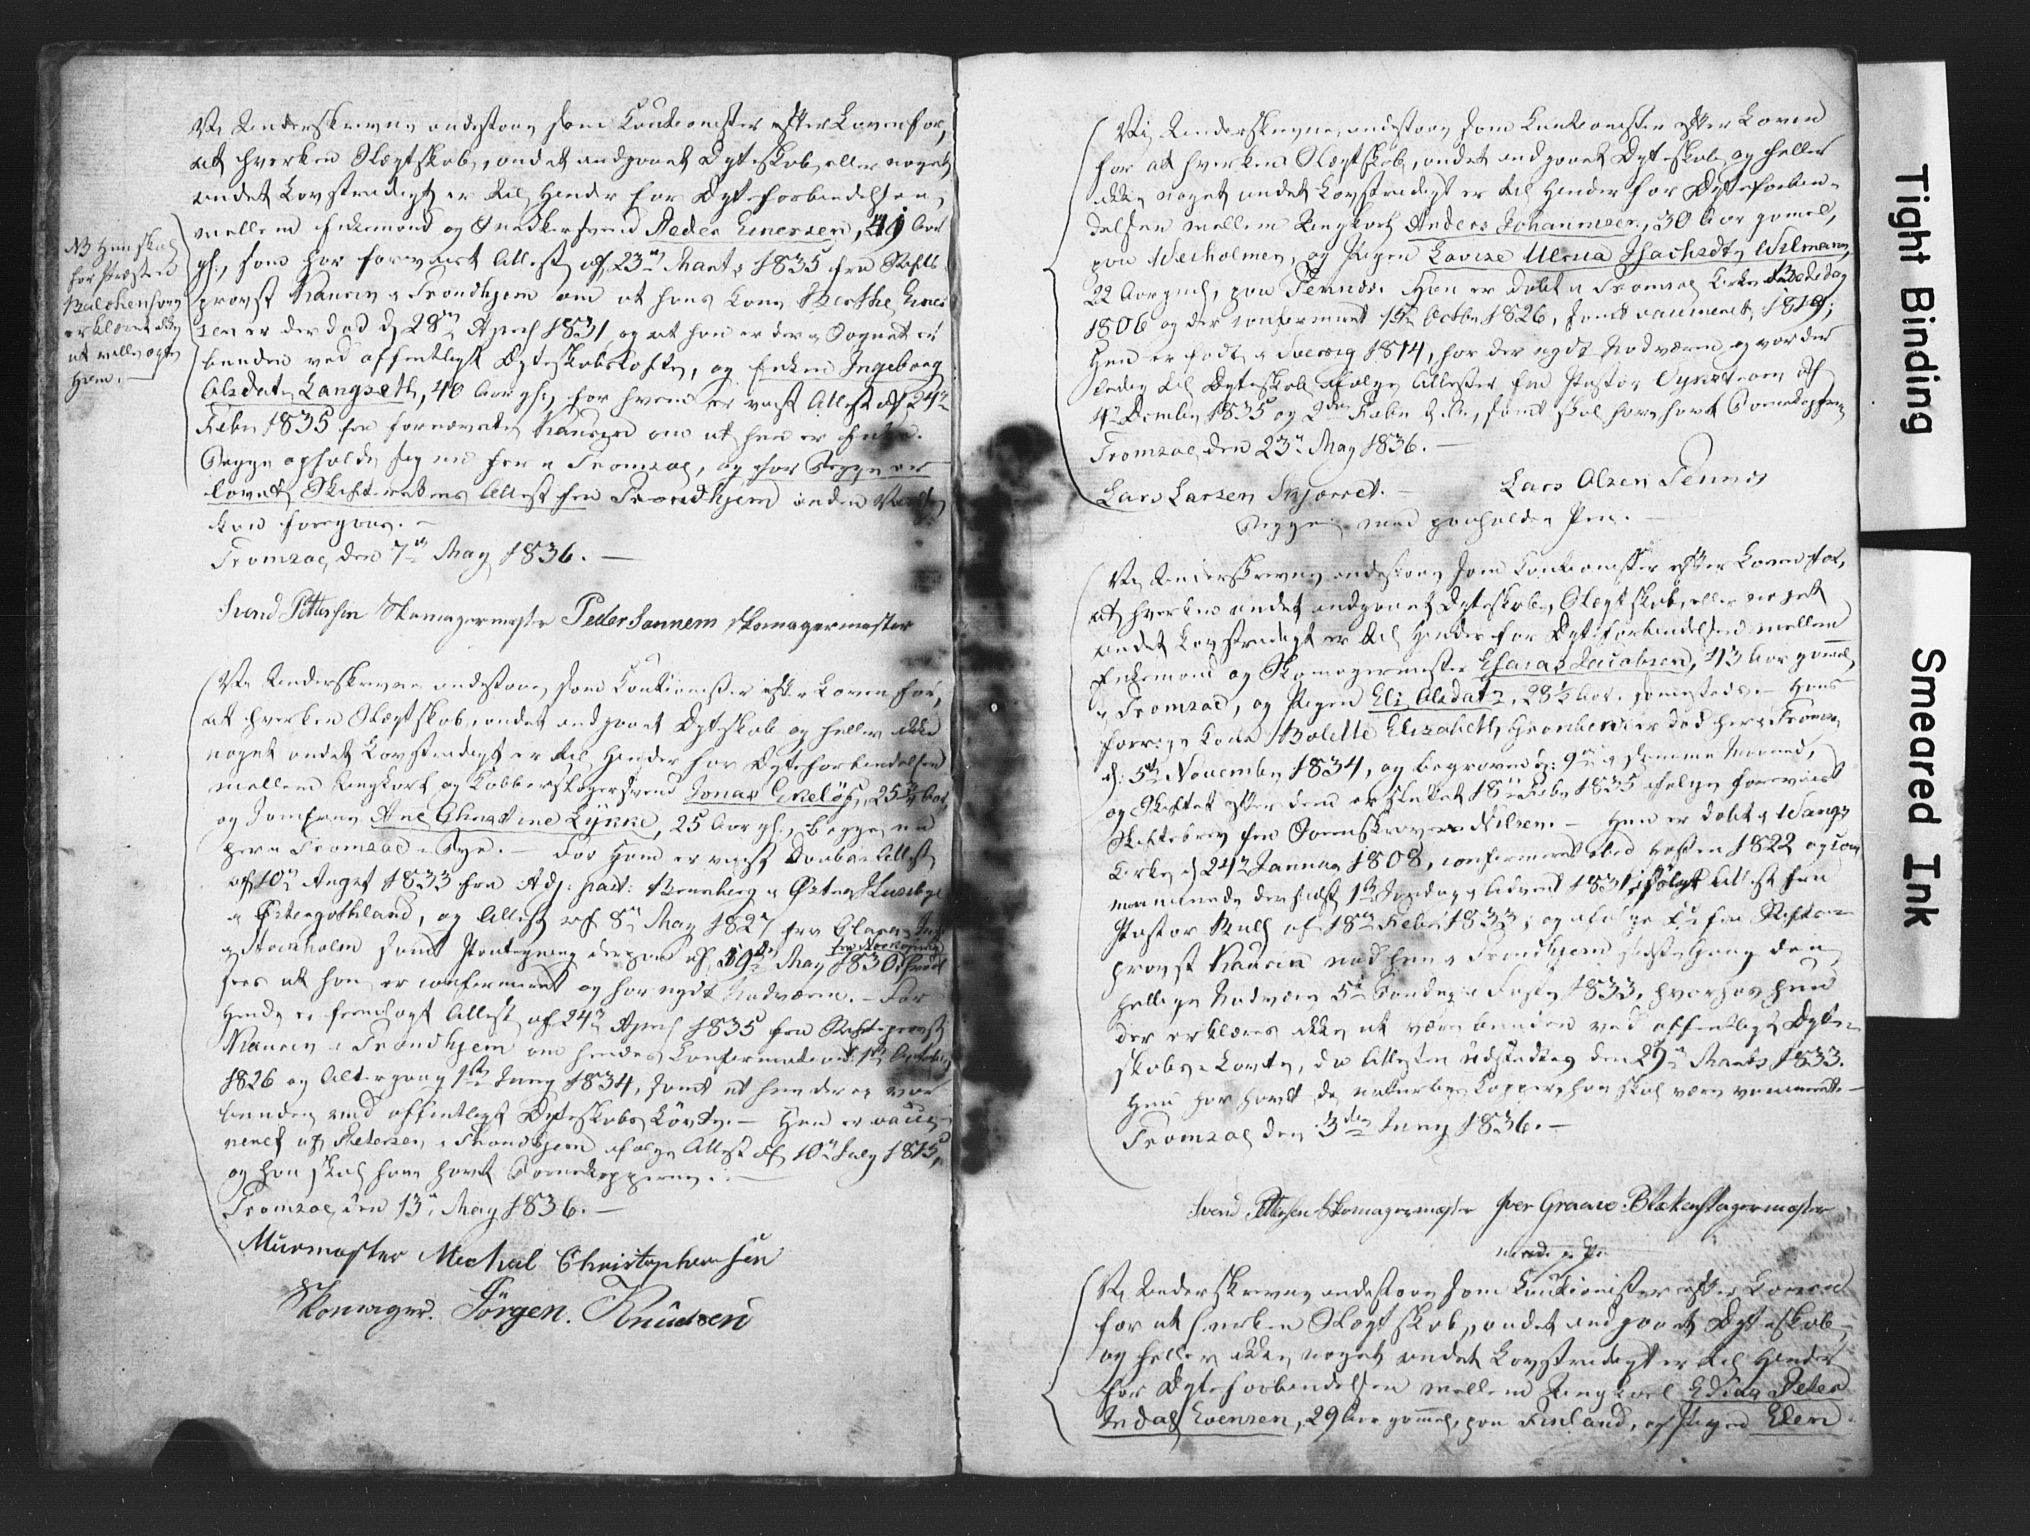 SATØ, Tromsø sokneprestkontor/stiftsprosti/domprosti, H/Hc/L0095: Forlovererklæringer nr. 1, 1836-1838